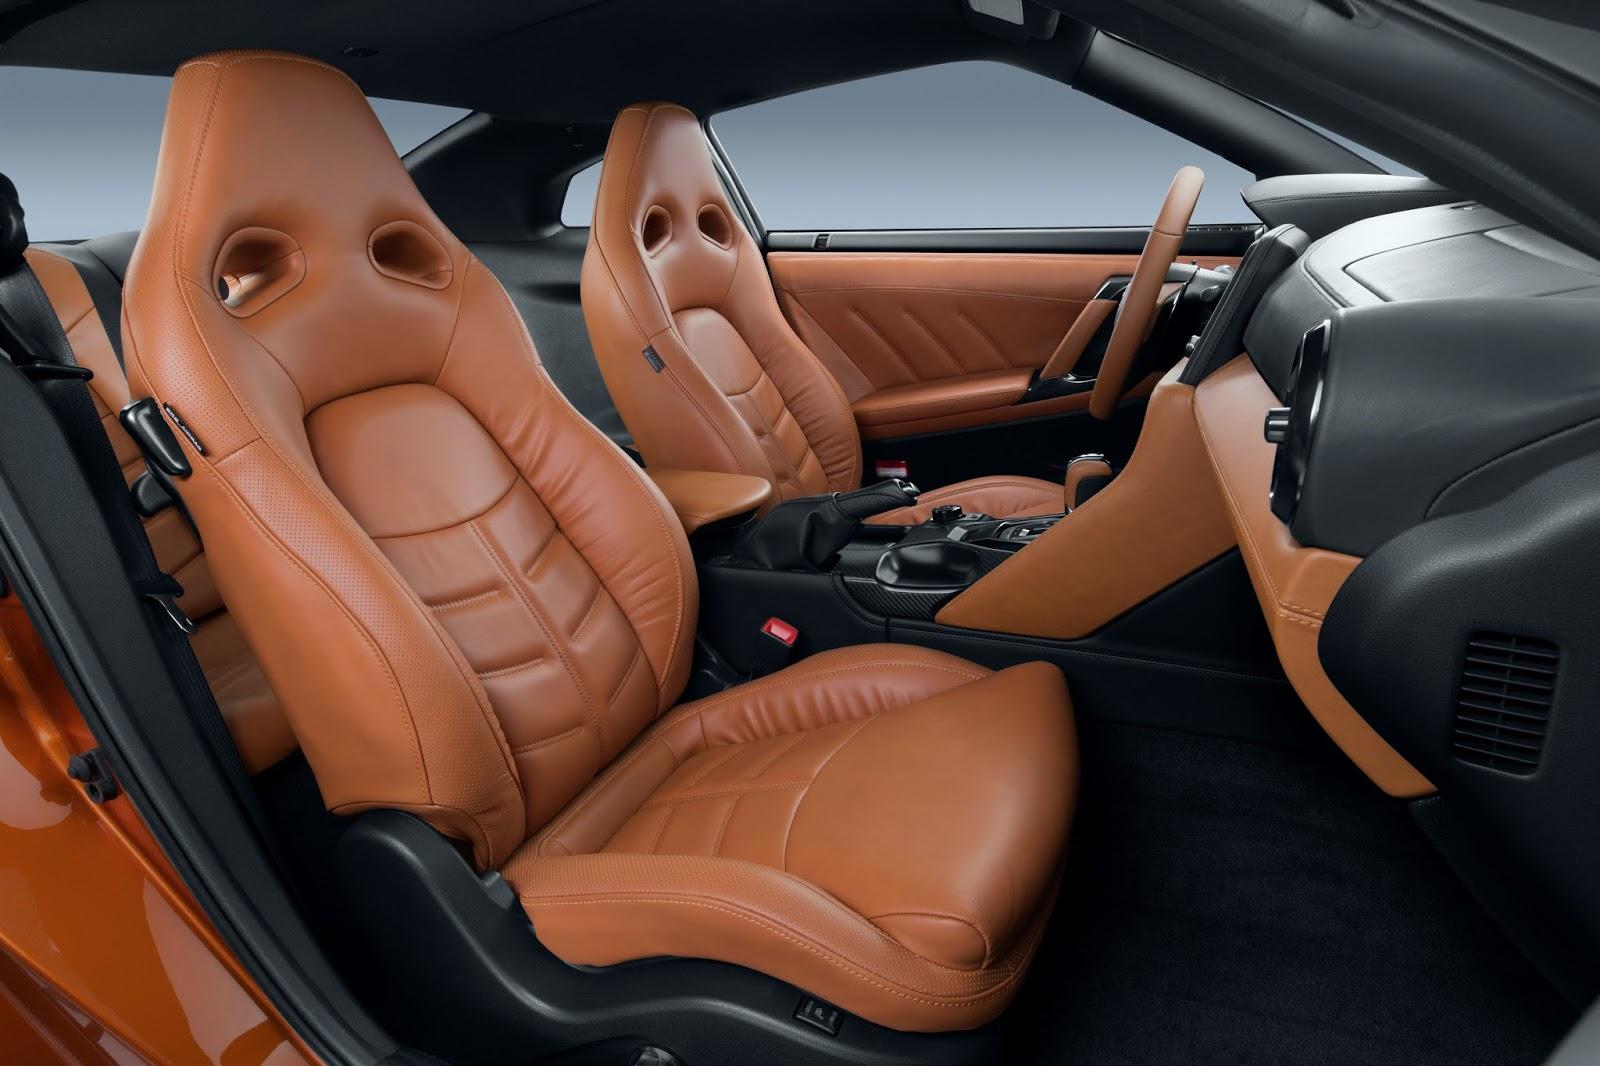 144057 1 5 Nissan GT-R: Ο Godzilla επέστρεψε! Godzilla, Nissan, Nissan GT-R, supercars, έκθεση Νέας Υόρκης